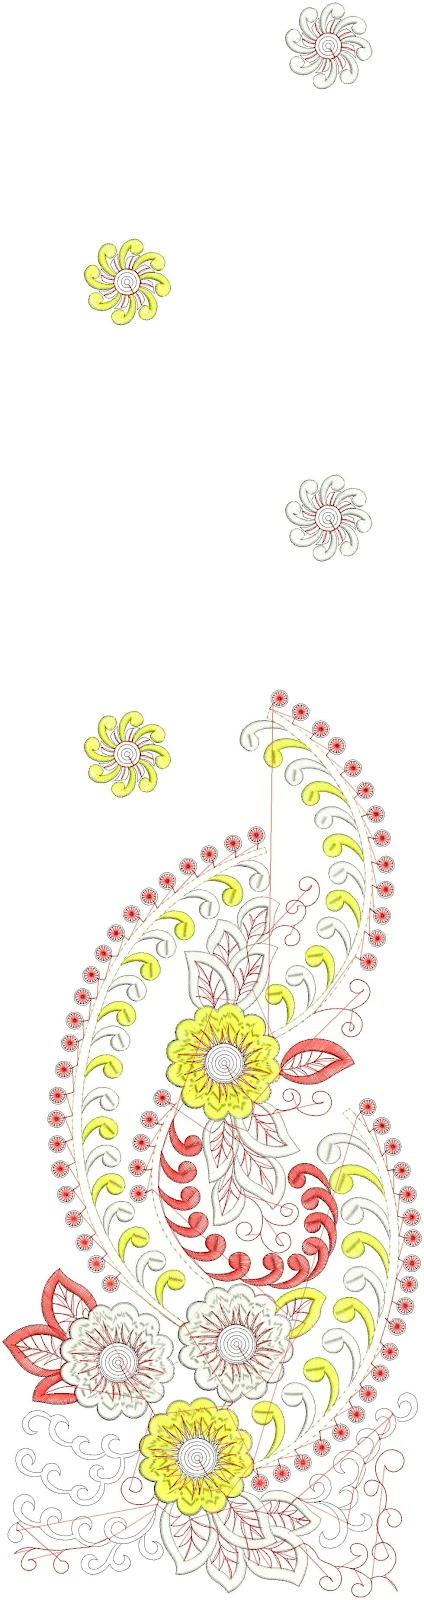 Embdesigntube fresh daman embroidery designs